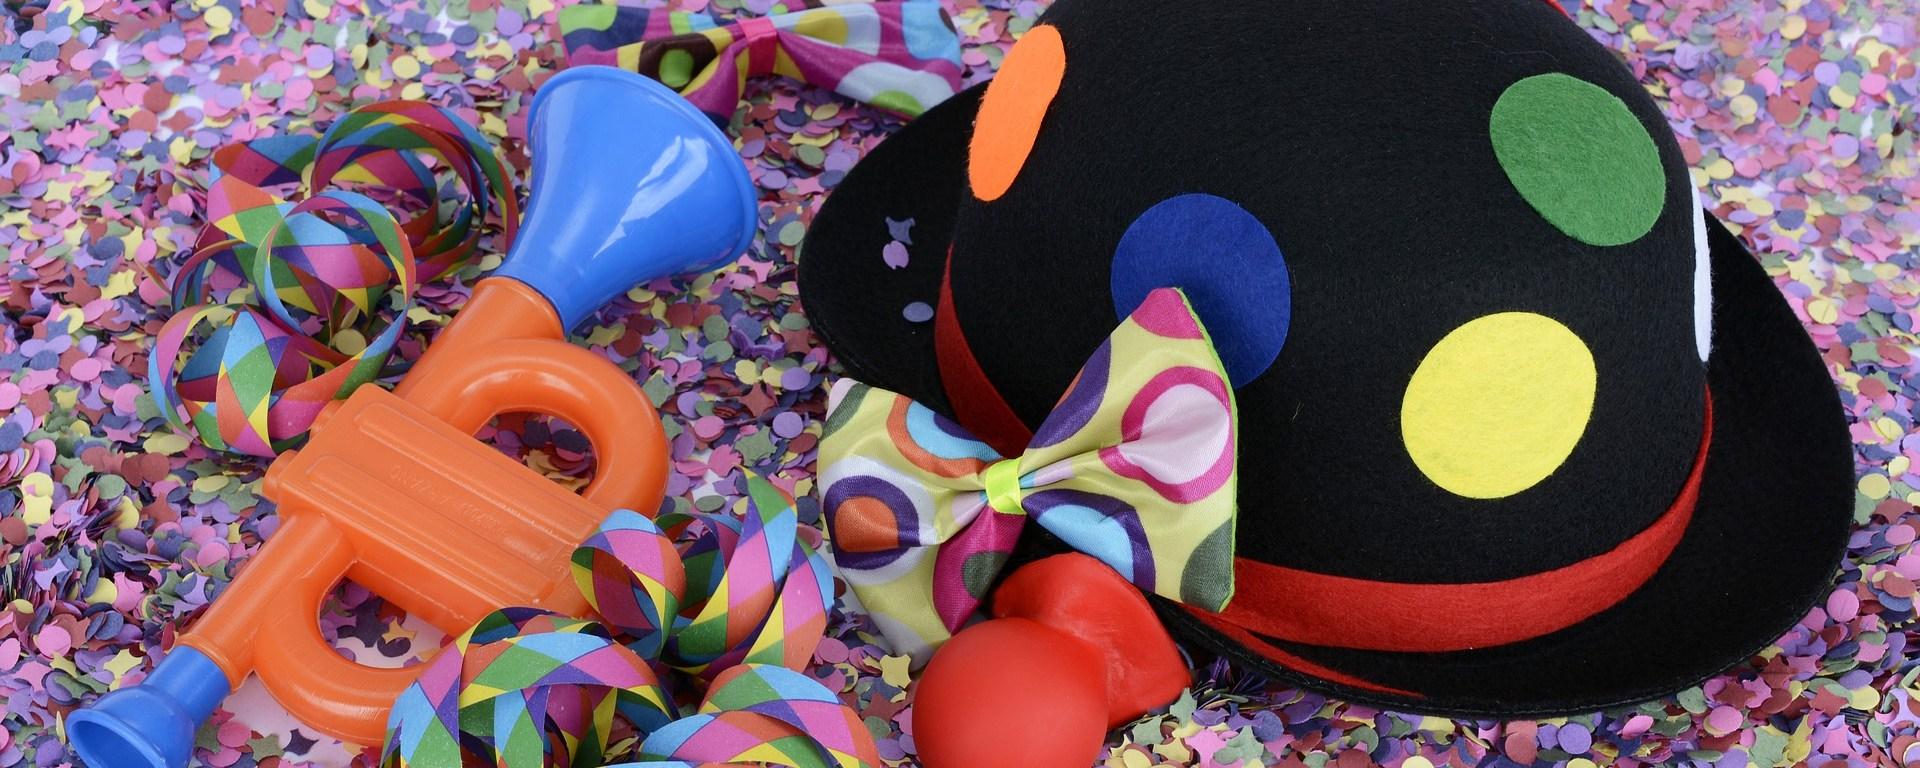 Karnevalshut mit Konfetti